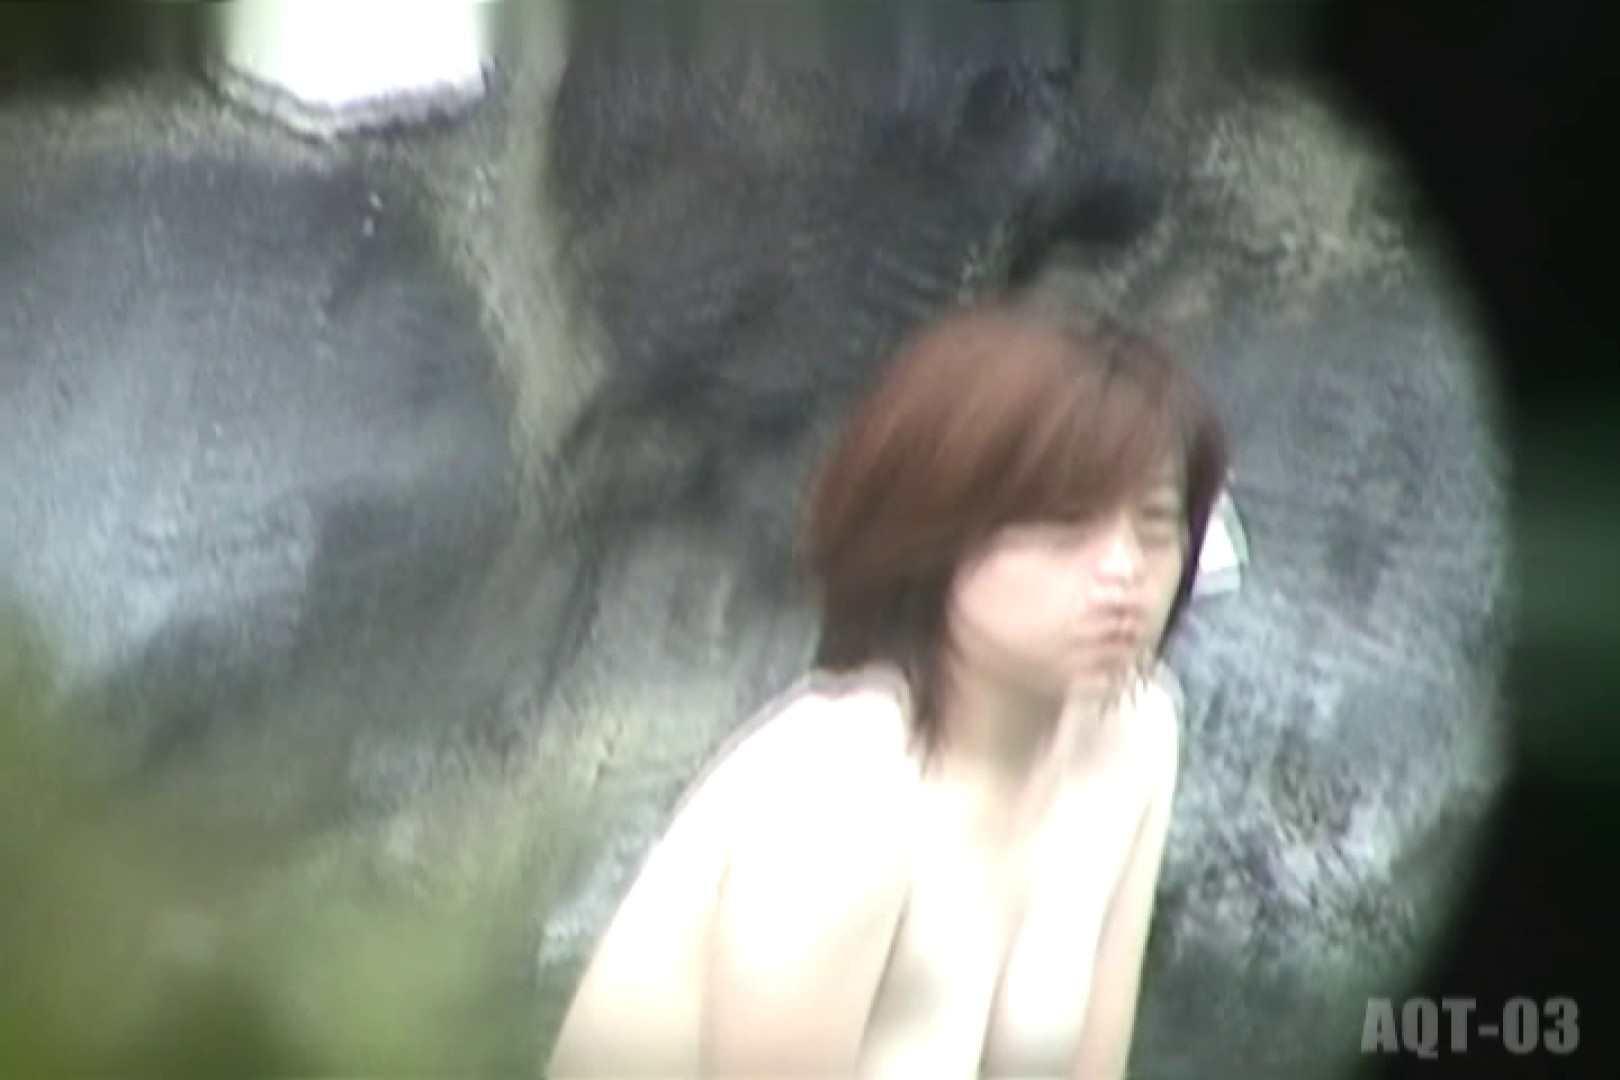 Aquaな露天風呂Vol.731 盗撮師作品  91pic 87